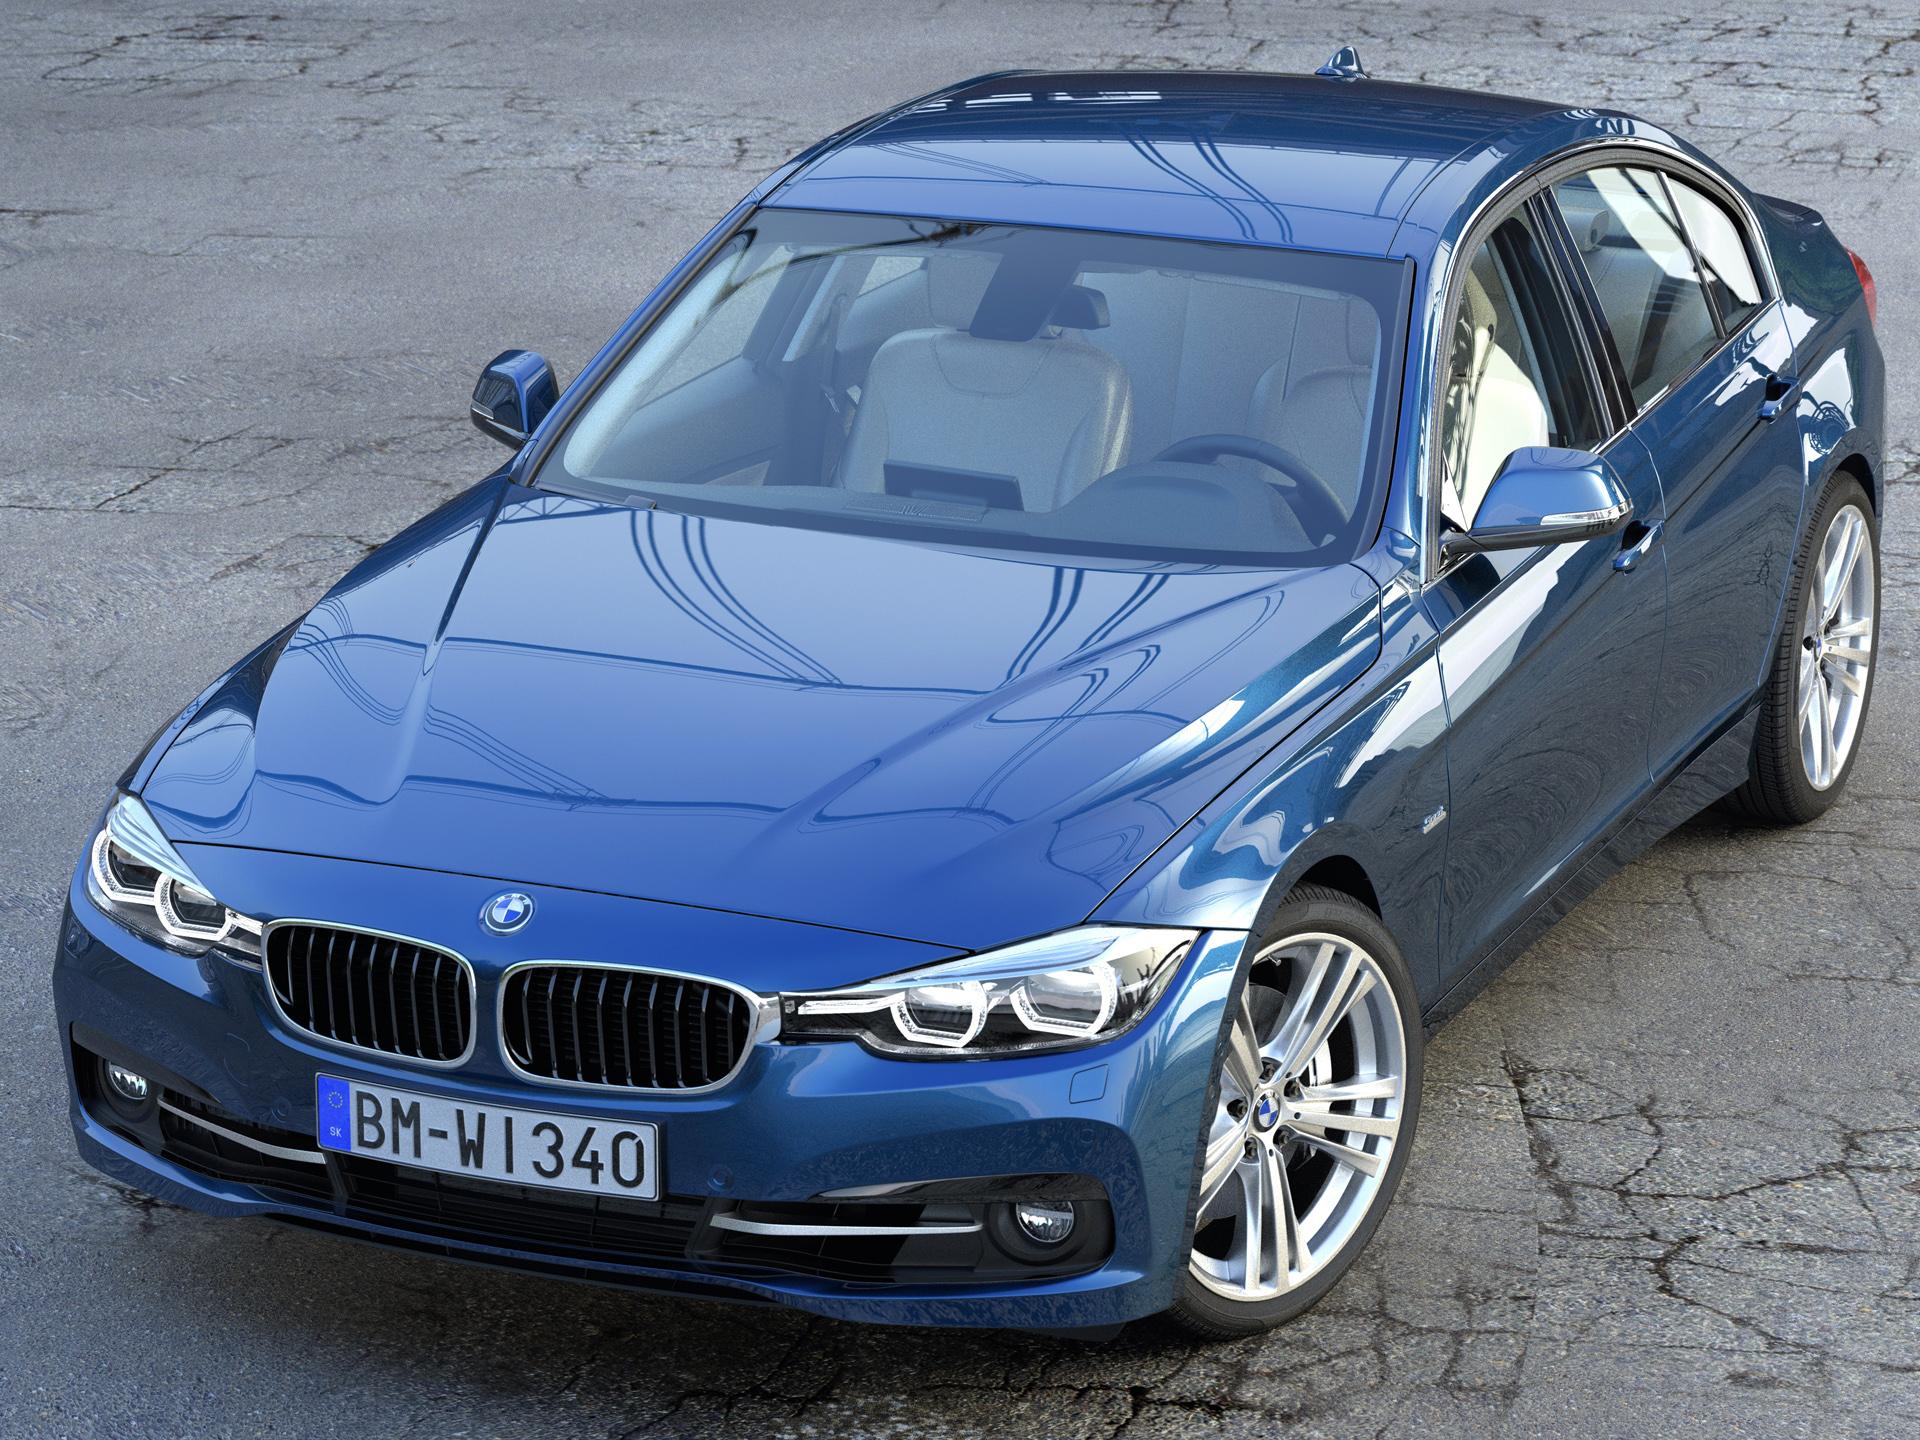 BMW 3 series F30 Sport Line 2016 3d model 3ds max fbx c4d obj 213446